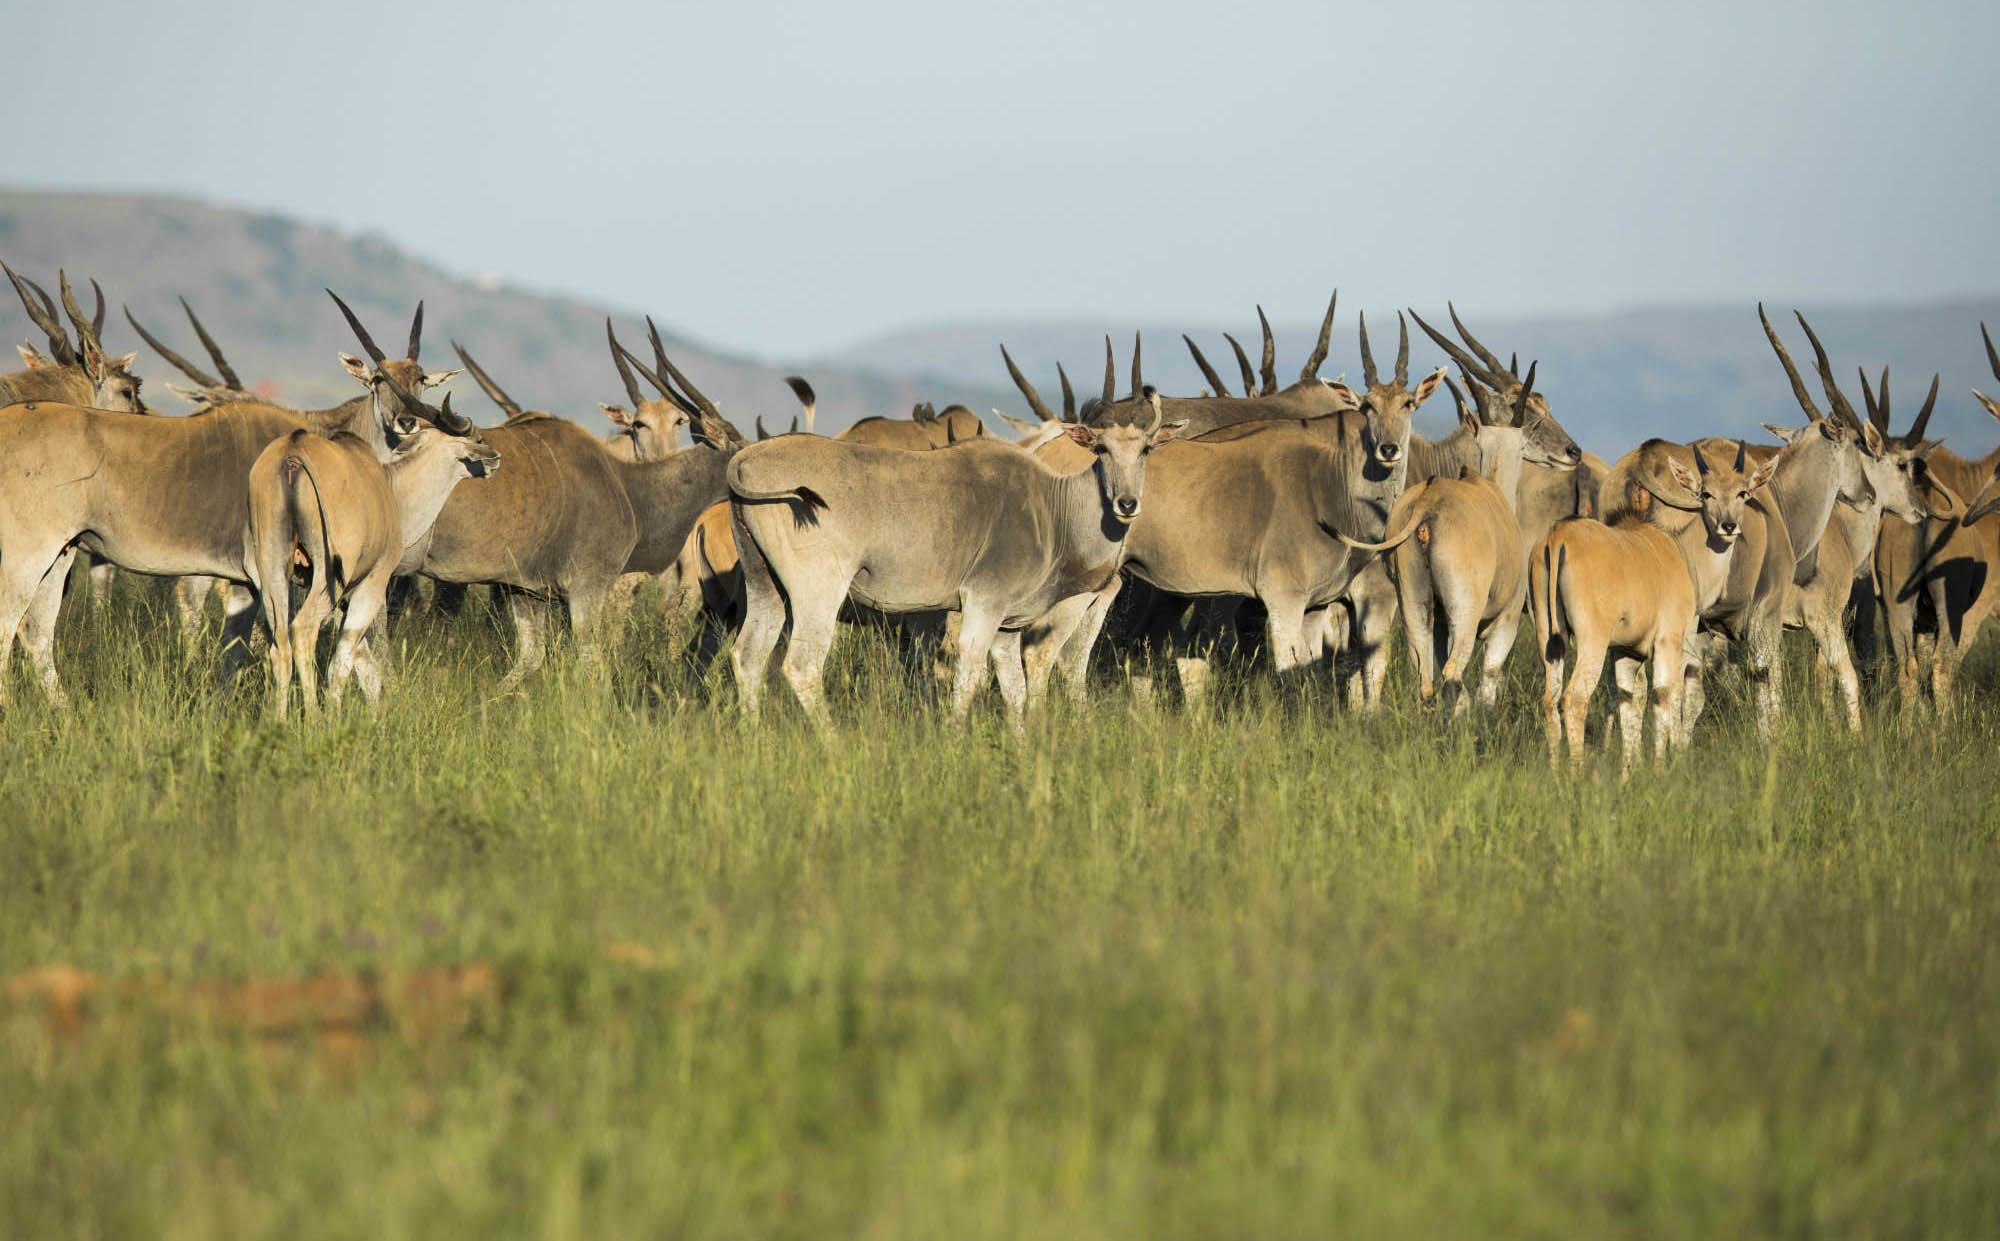 Ndaka safari lodge - wildlife at nambiti big 5 private game reserve